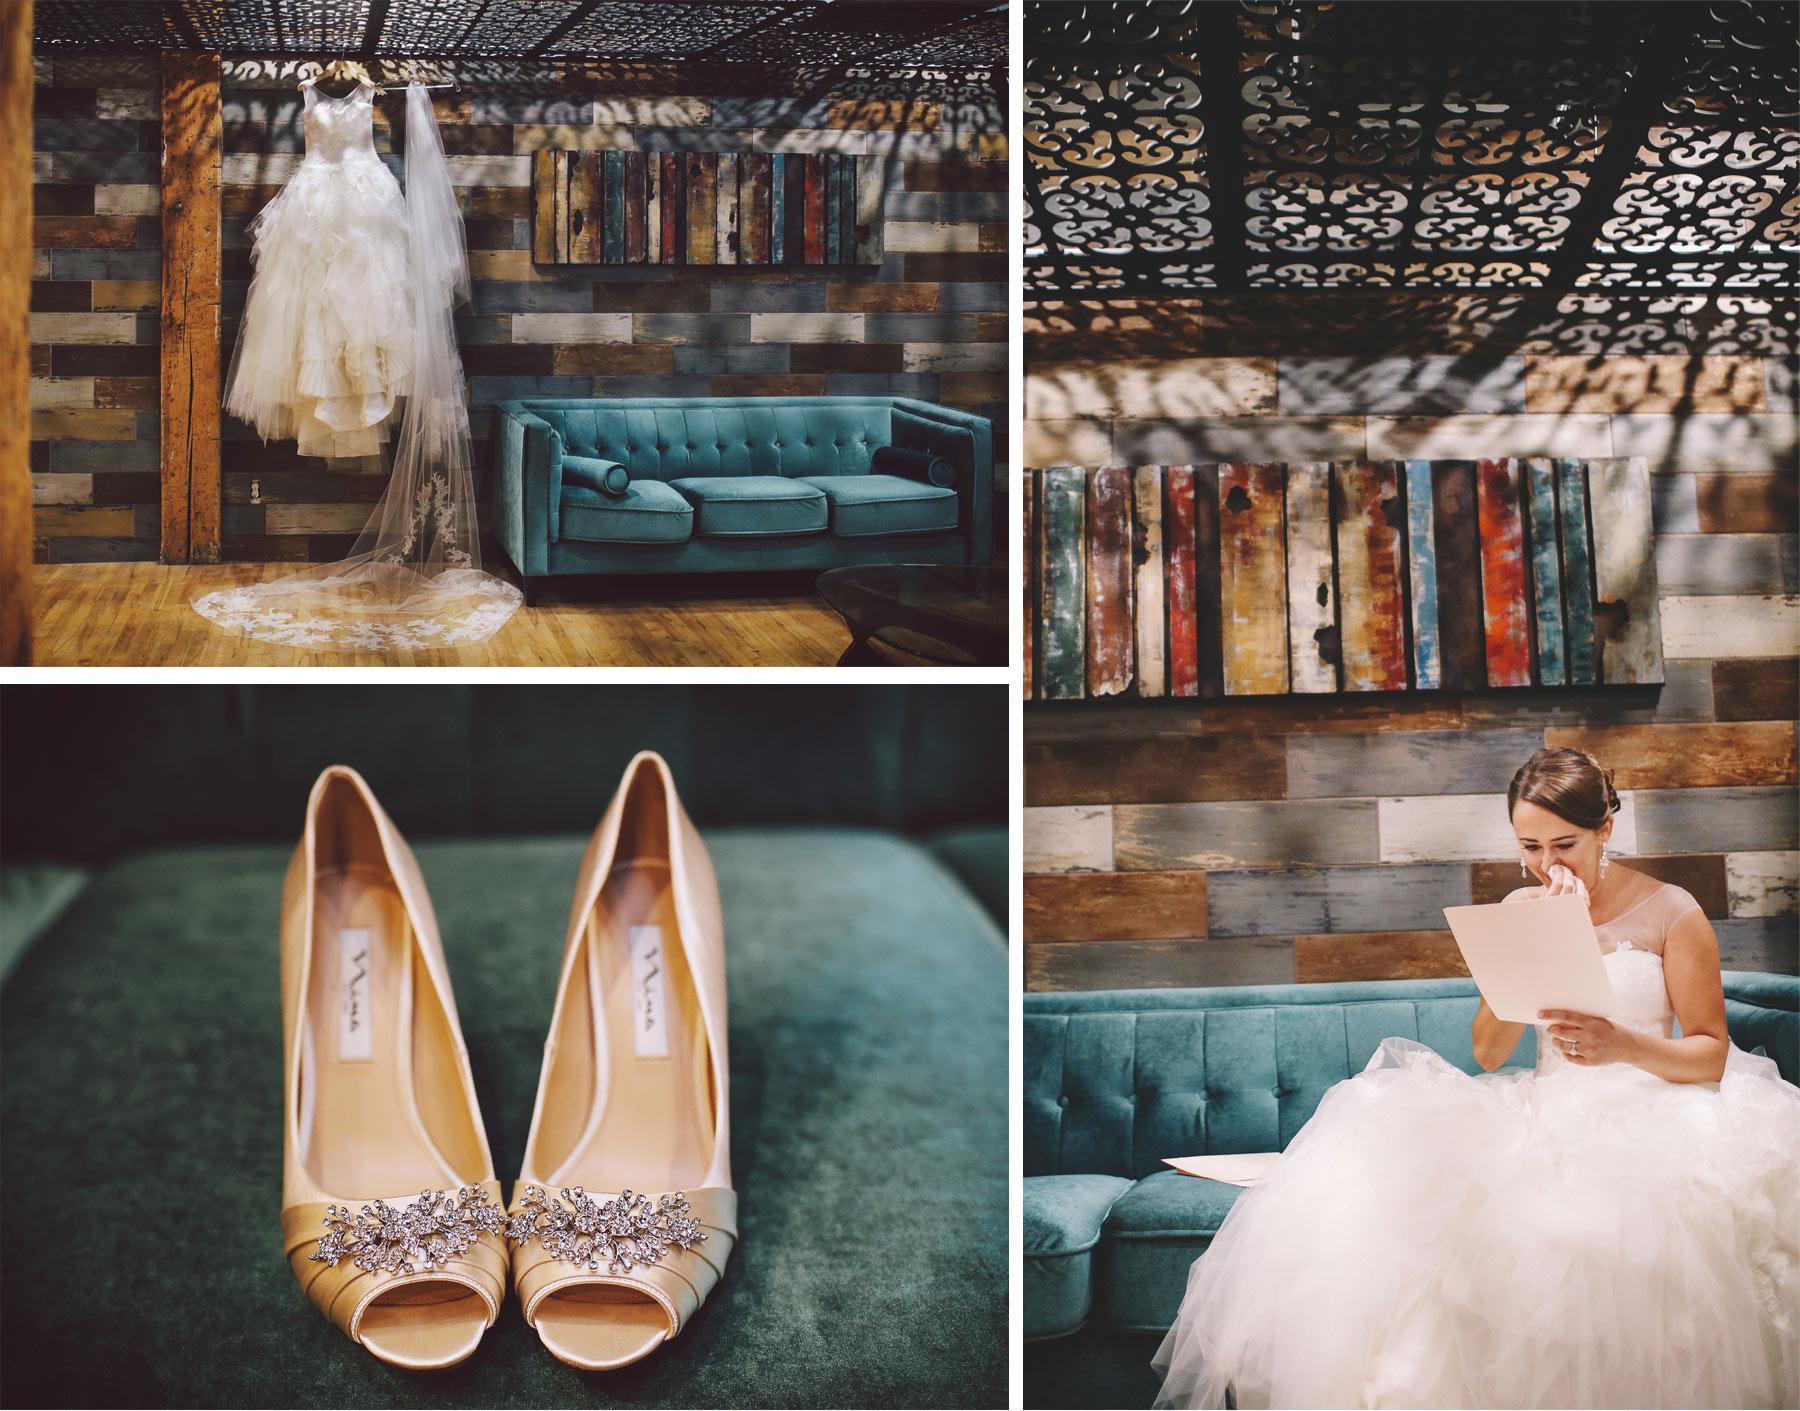 01-Minneapolis-Minnesota-Wedding-Photography-by-Vick-Photography-The-View-Minneapolis-Event-Center-Shoes-Dress-Brigid-and-Ernie.jpg